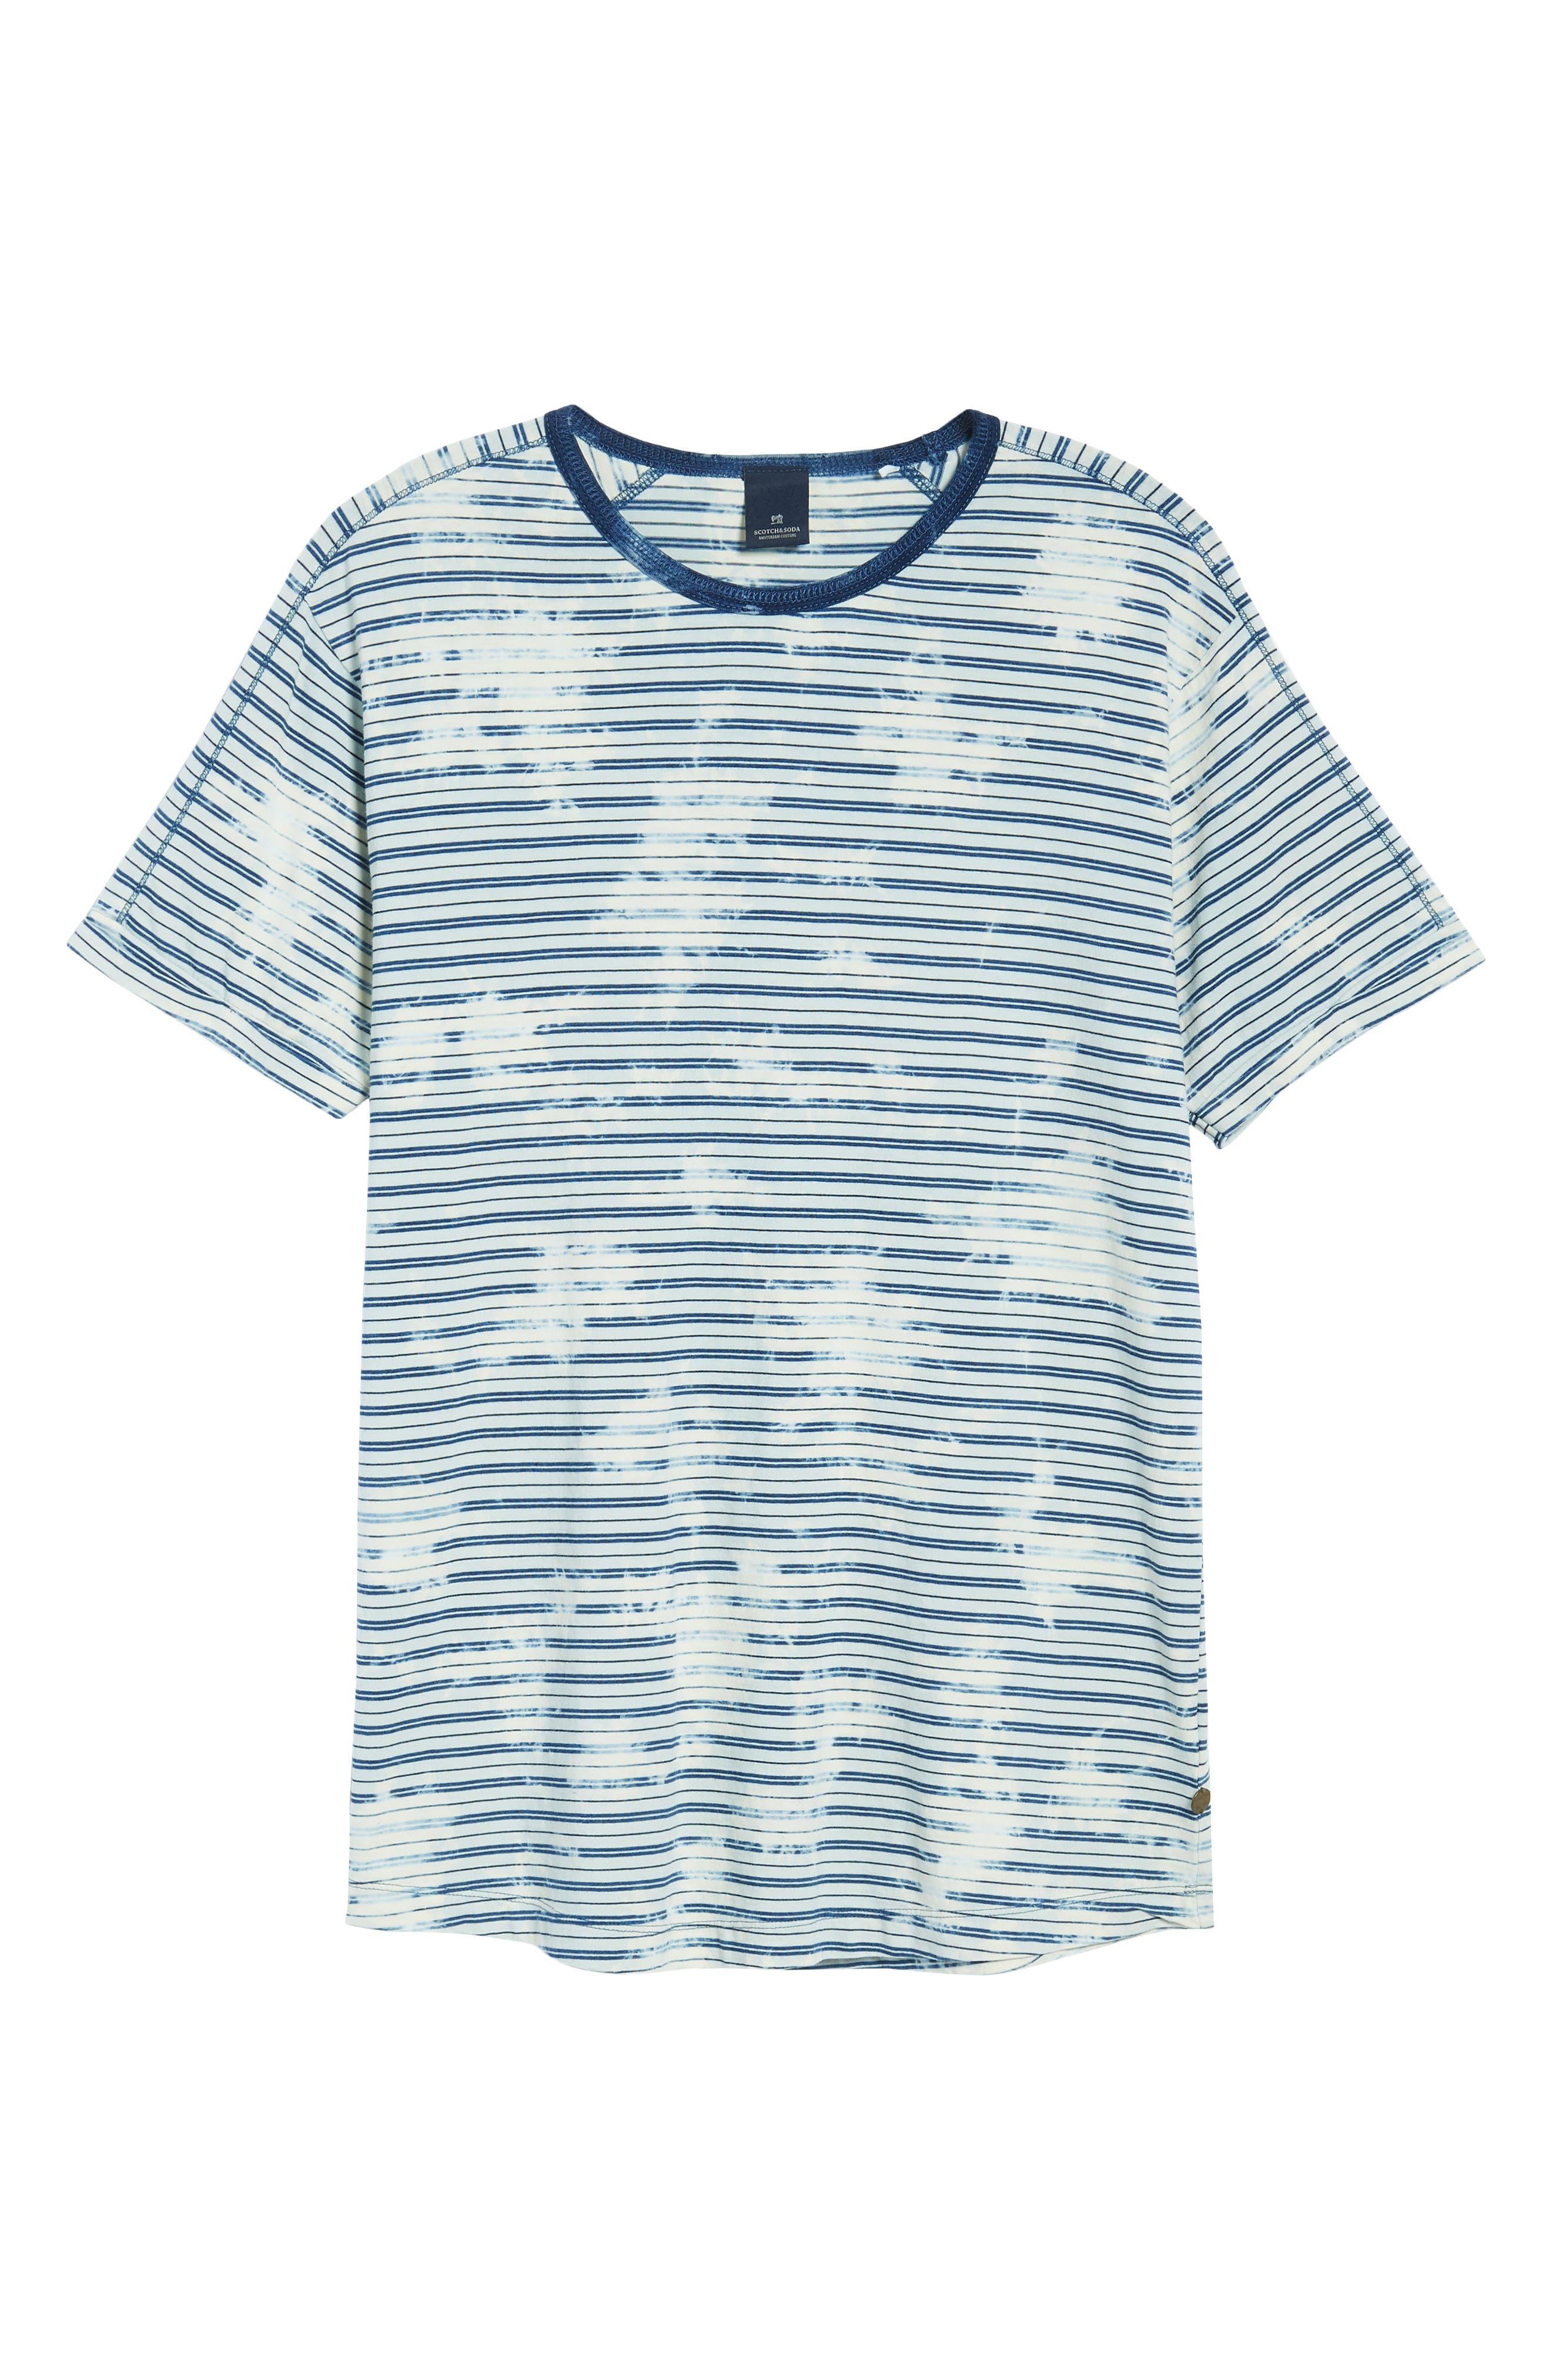 Washed Crewneck T-Shirt,                             Alternate thumbnail 6, color,                             400